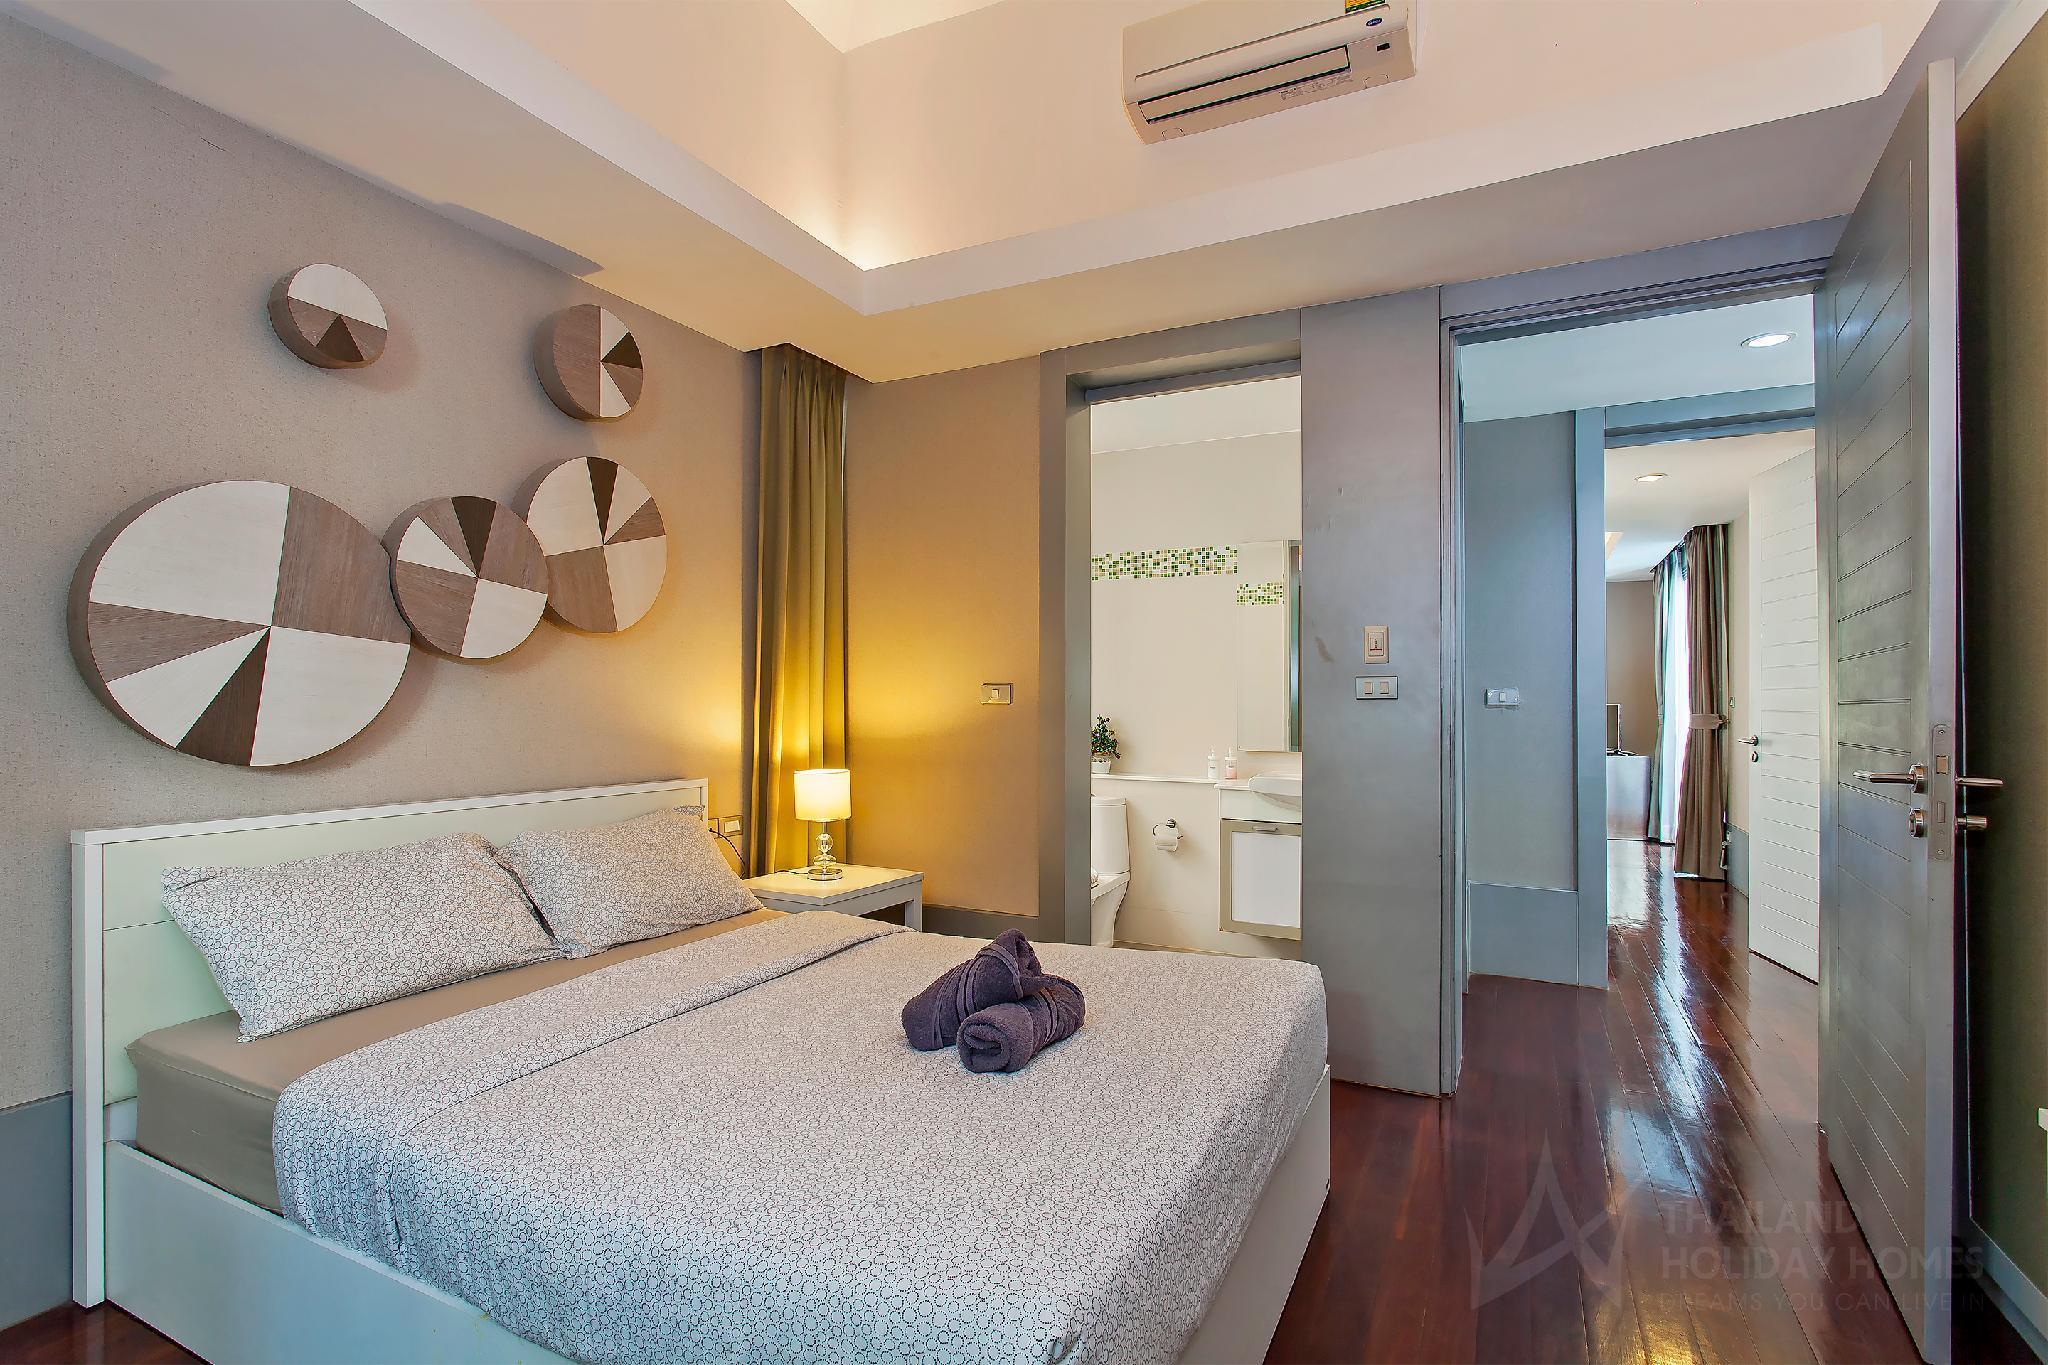 Villa Mentha | Chic 2 Bed Pool Home in Jomtien วิลลา 2 ห้องนอน 2 ห้องน้ำส่วนตัว ขนาด 130 ตร.ม. – นาจอมเทียน